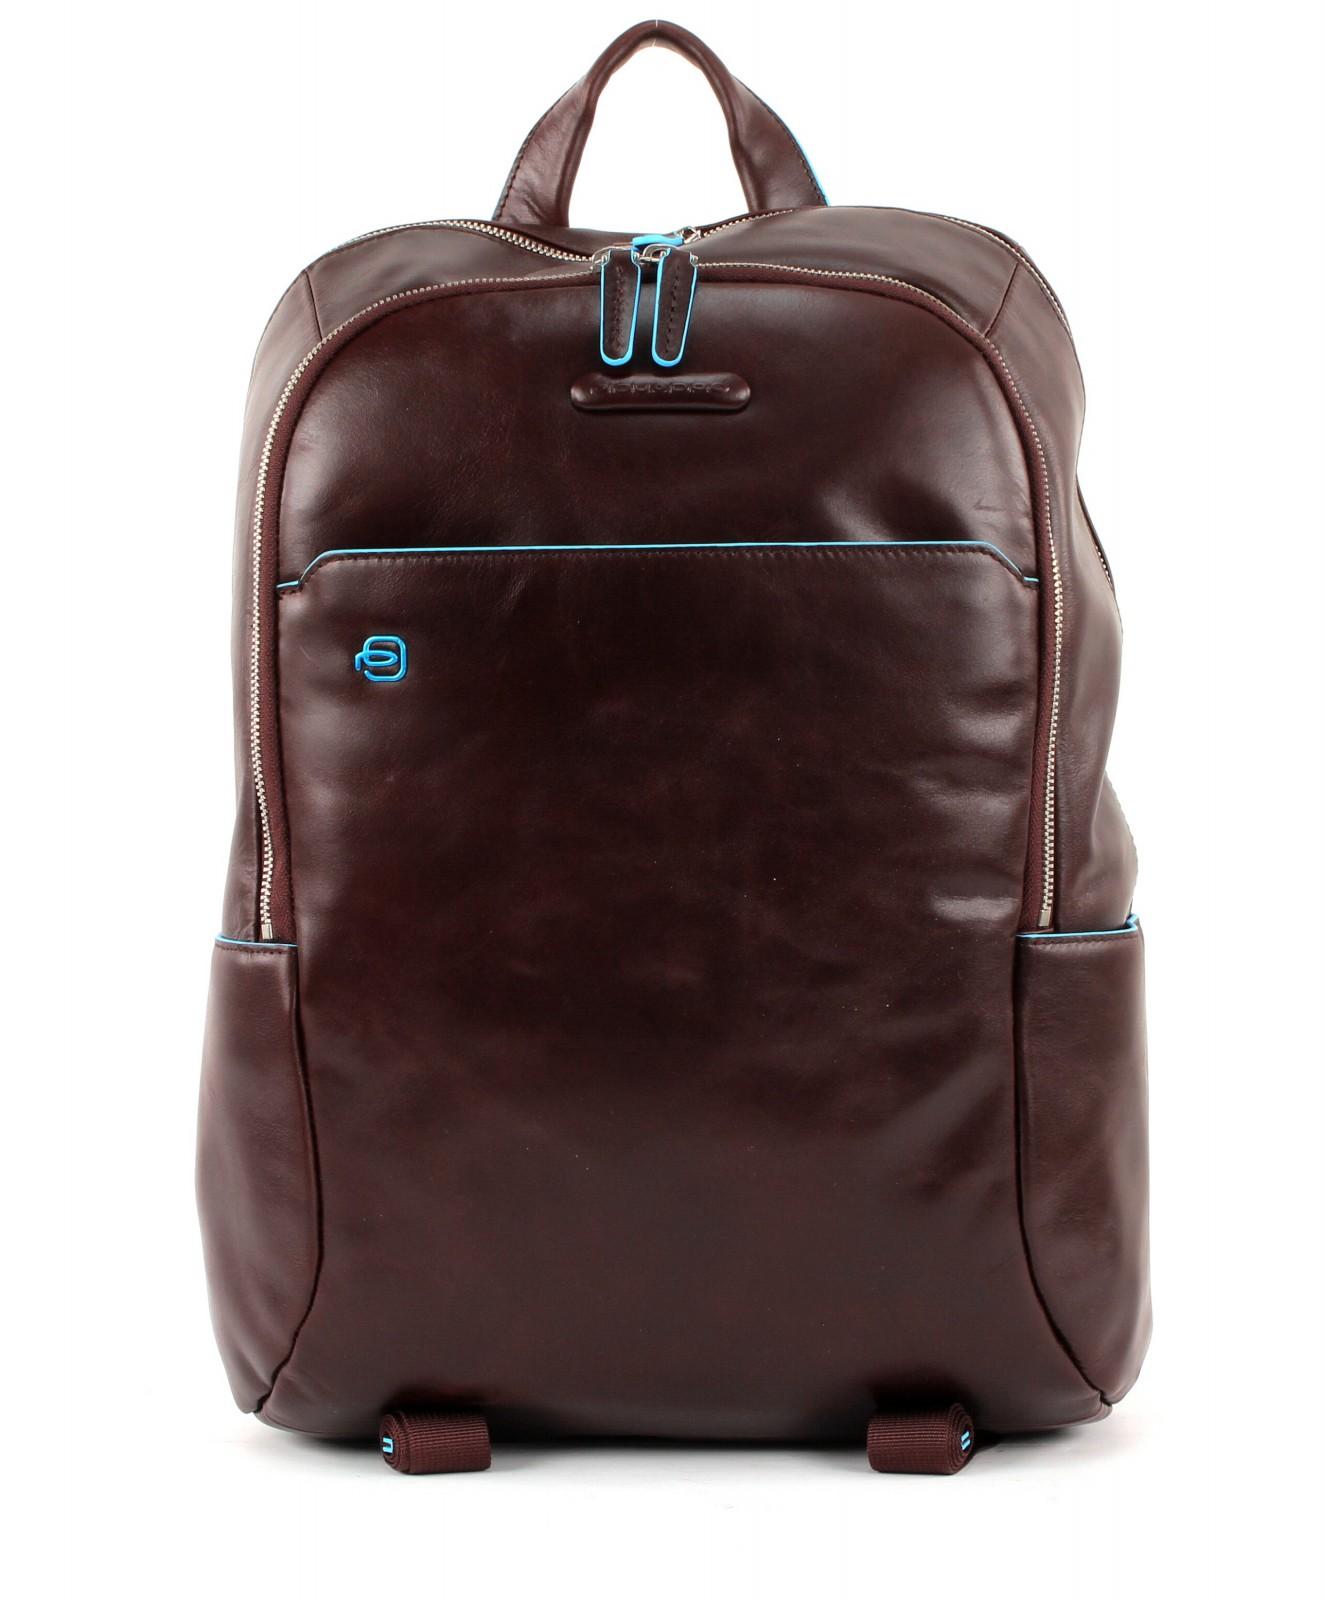 PIQUADRO Blue Square Laptop Backpack Mogano